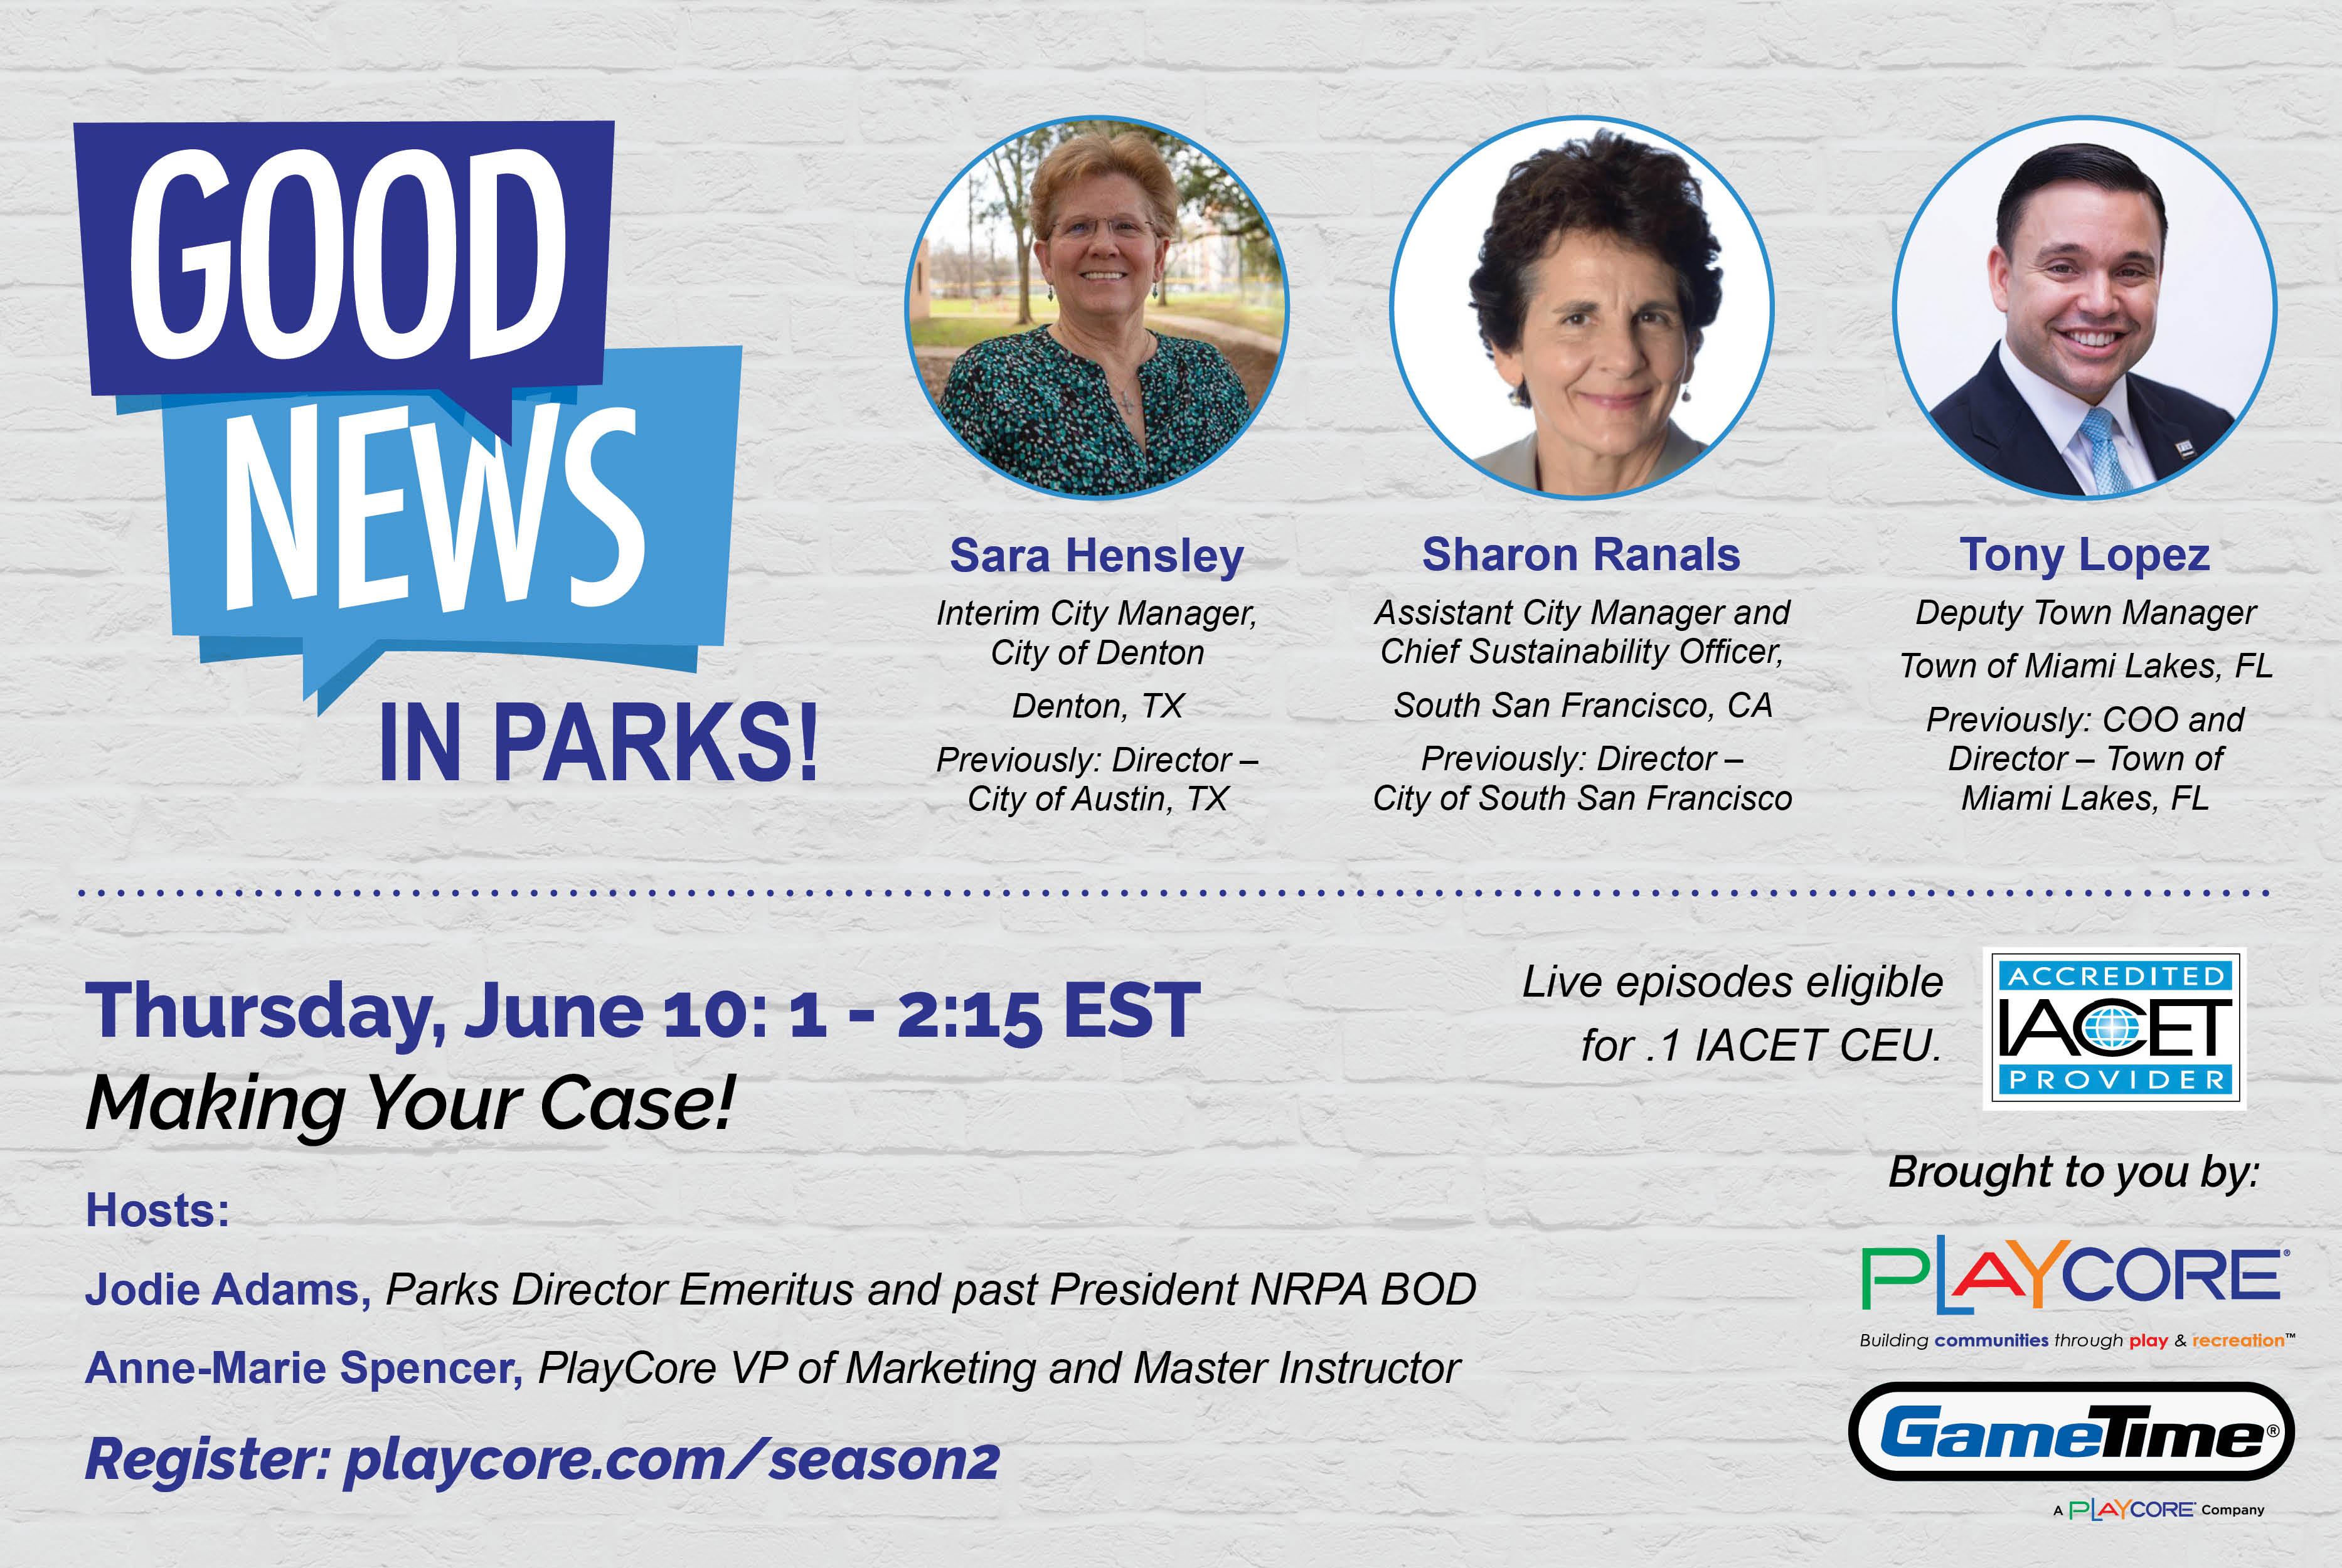 Good News in Parks - Season 2 - Banner Image - Episode 6